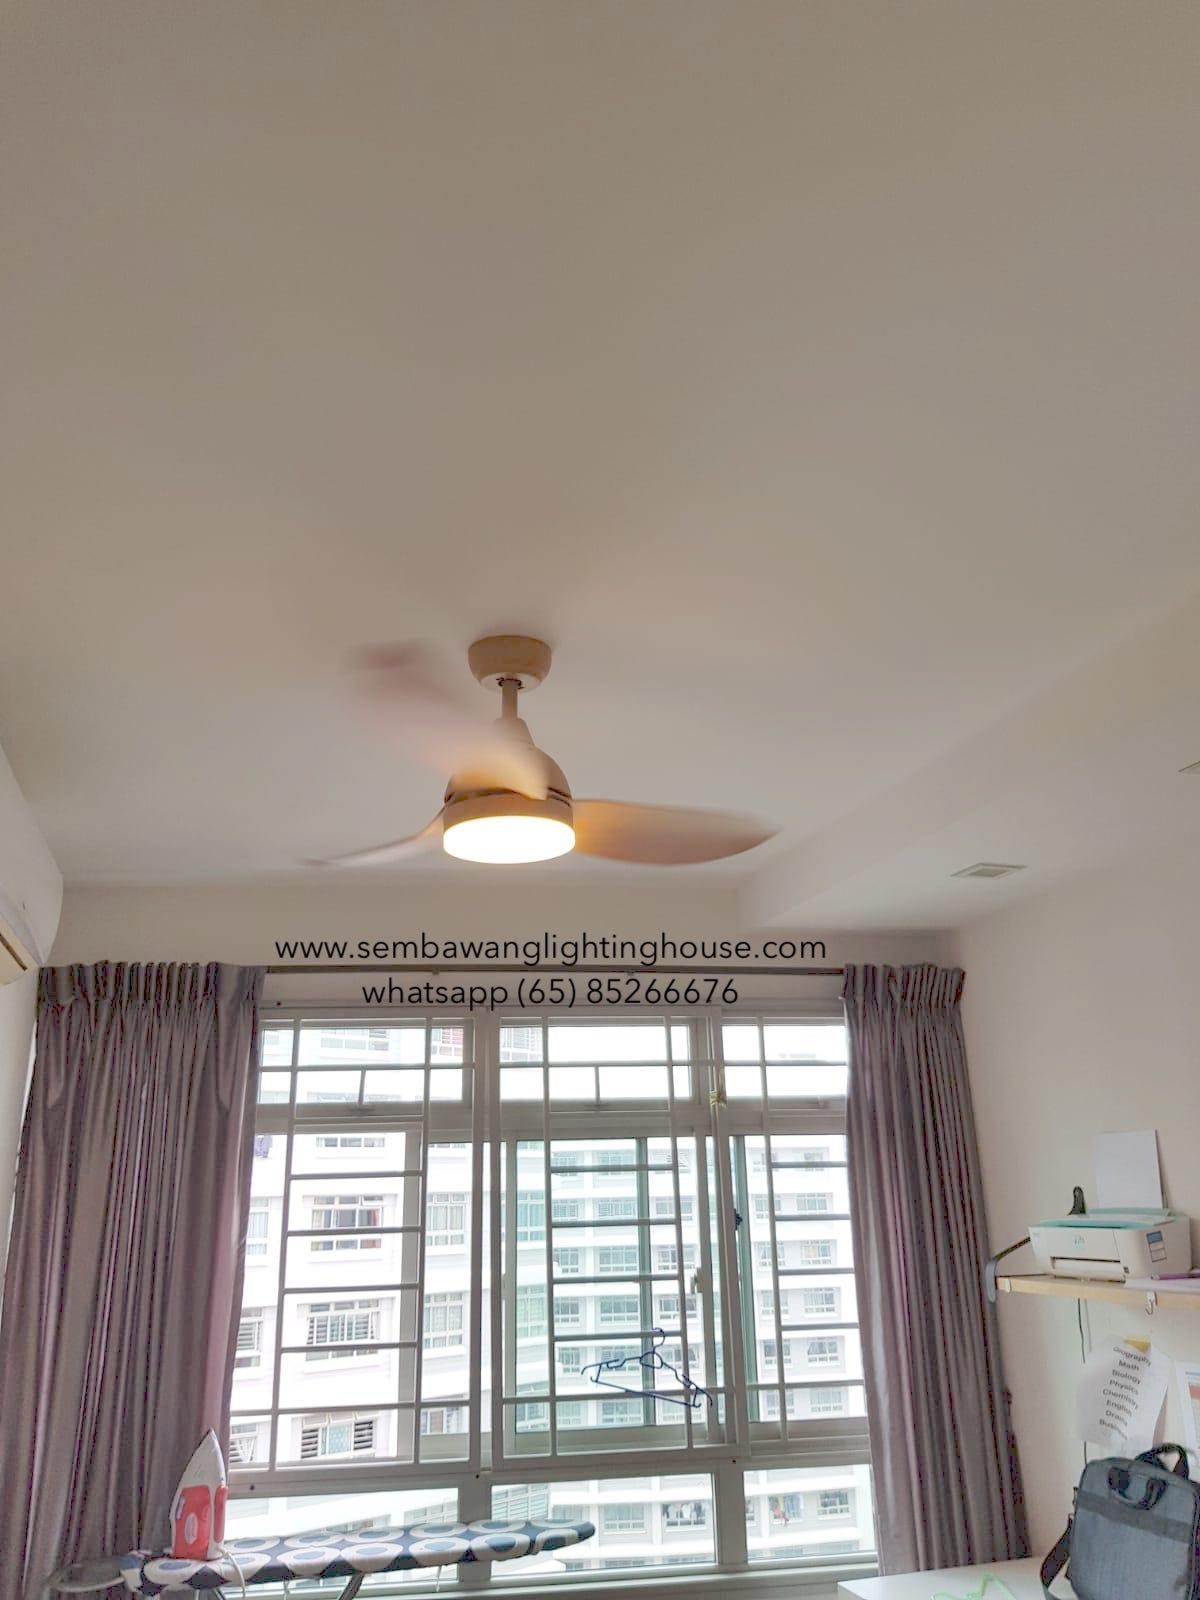 bestar-raptor-wood-ceiling-fan-with-light-sembawang-lighting-house-12.jpg